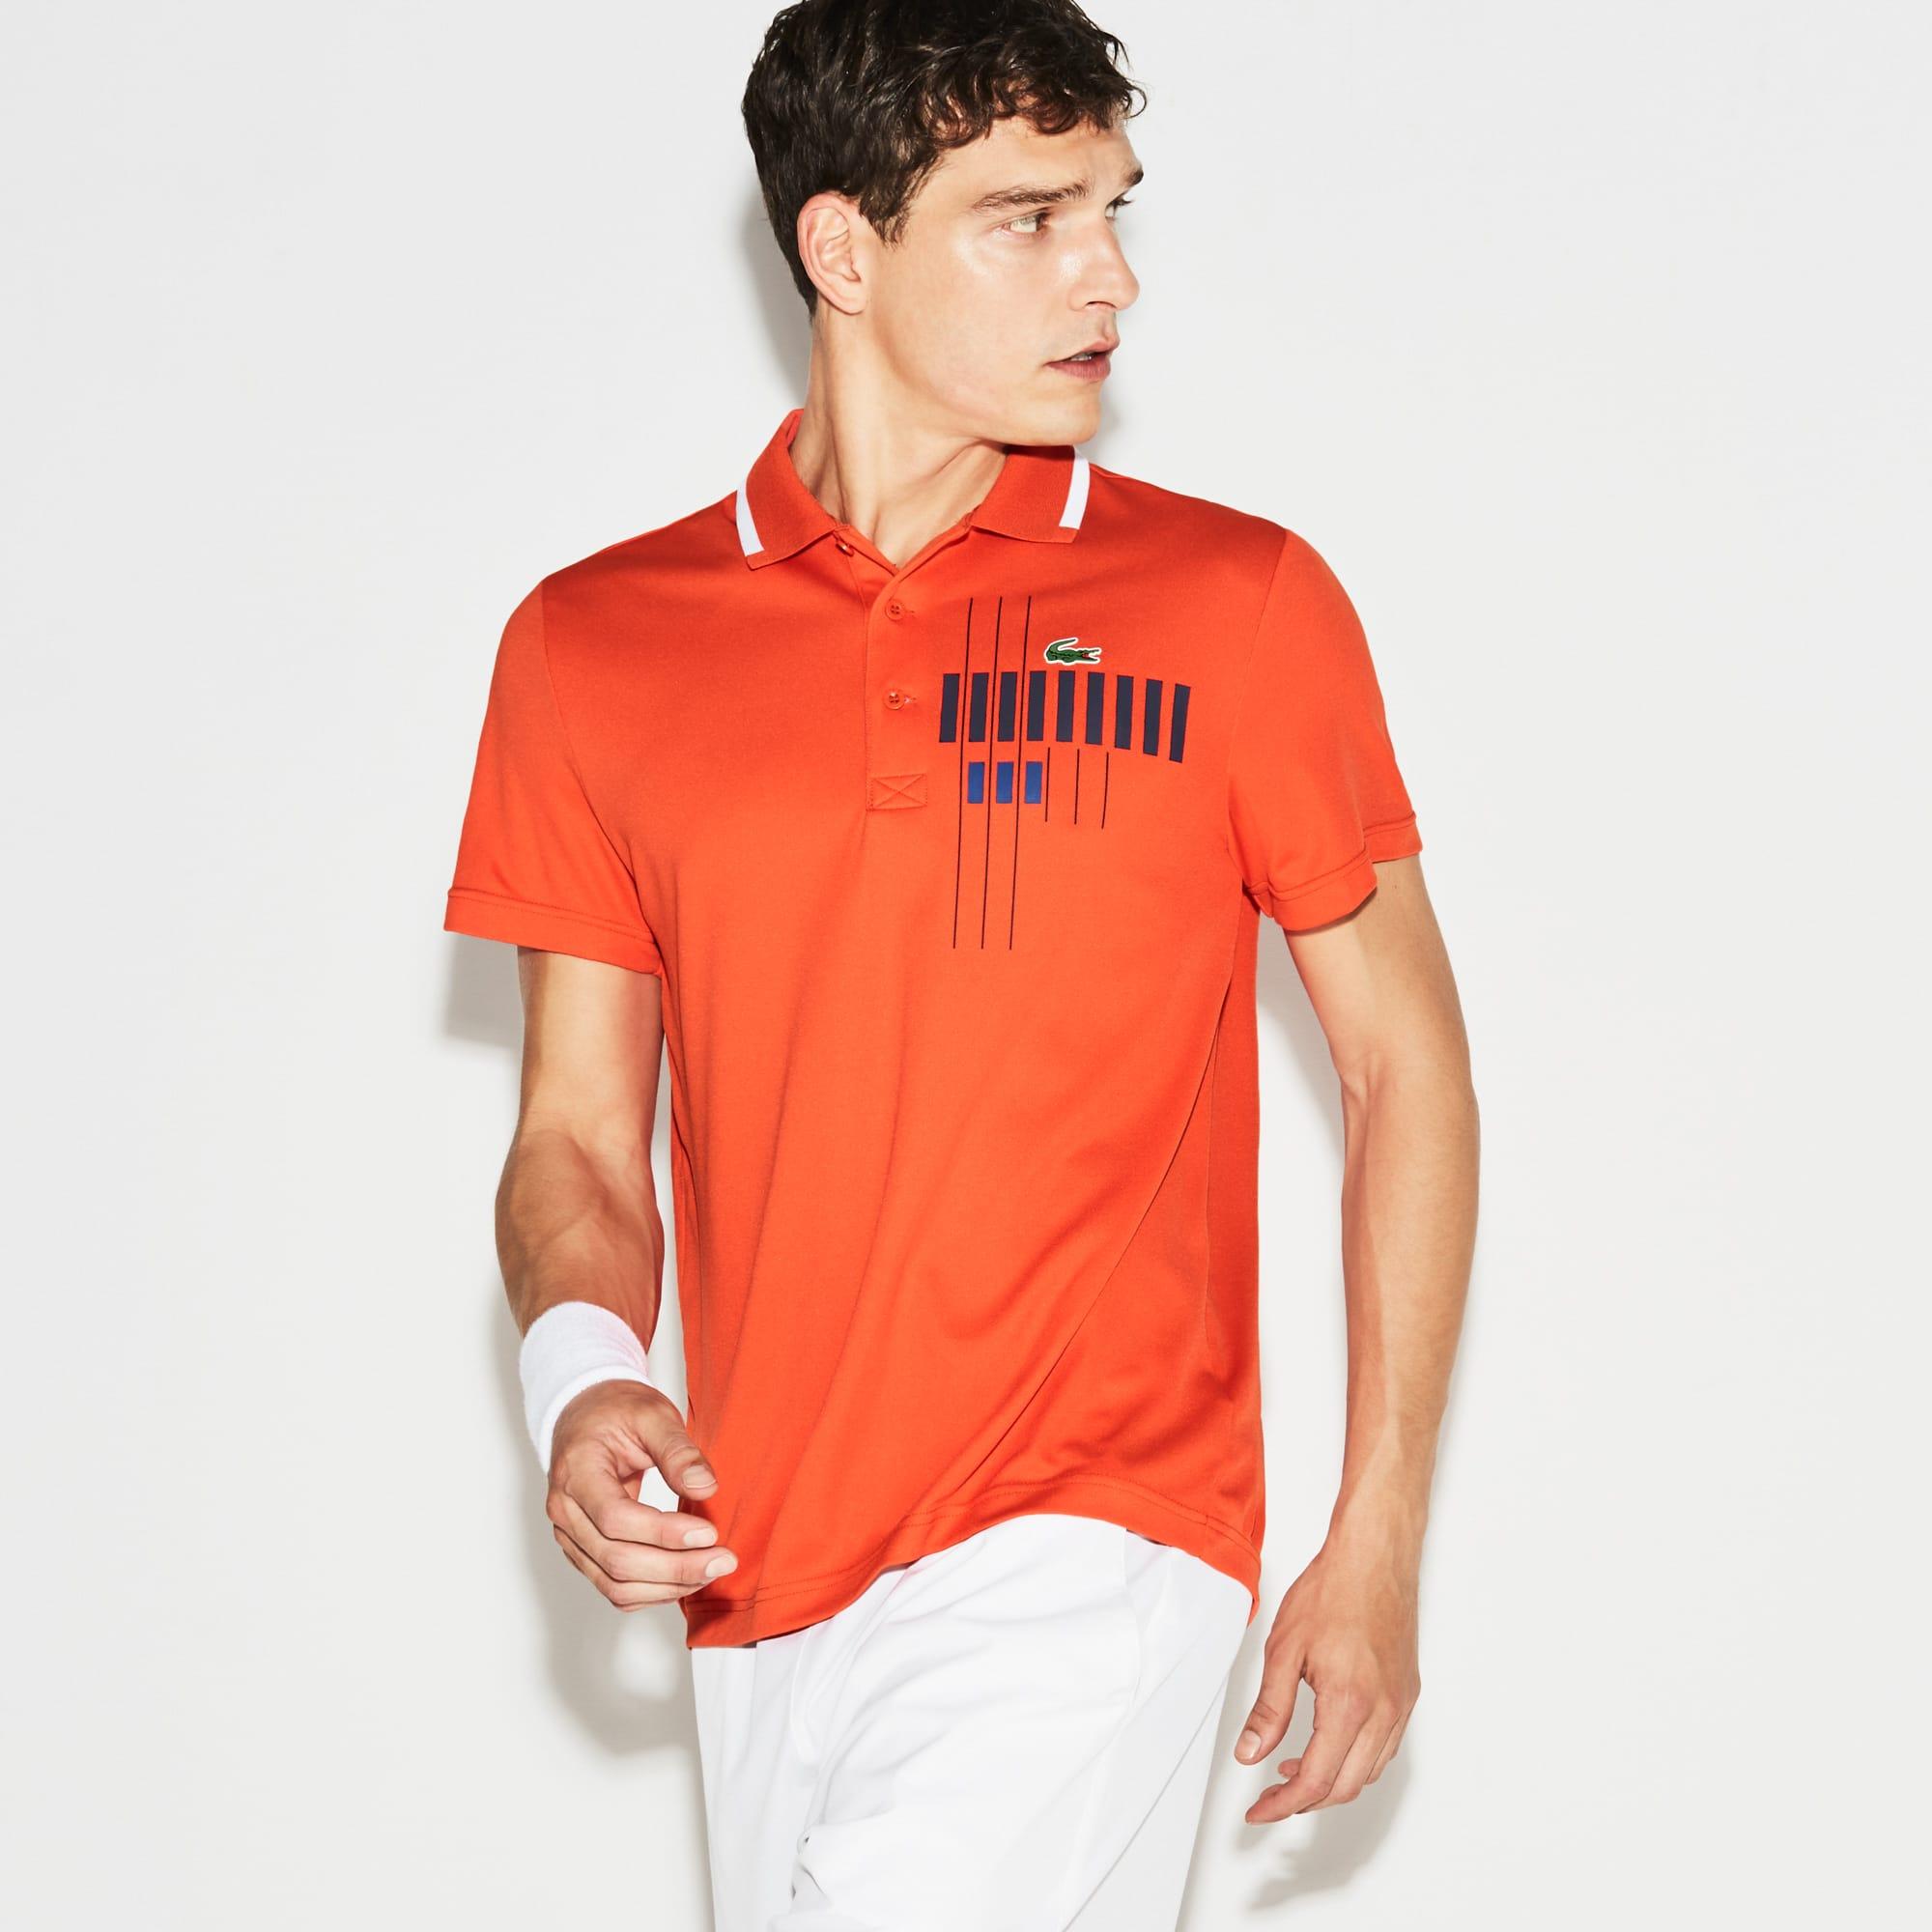 Men's Polo Lacoste x Novak Djokovic - Exclusive Edition